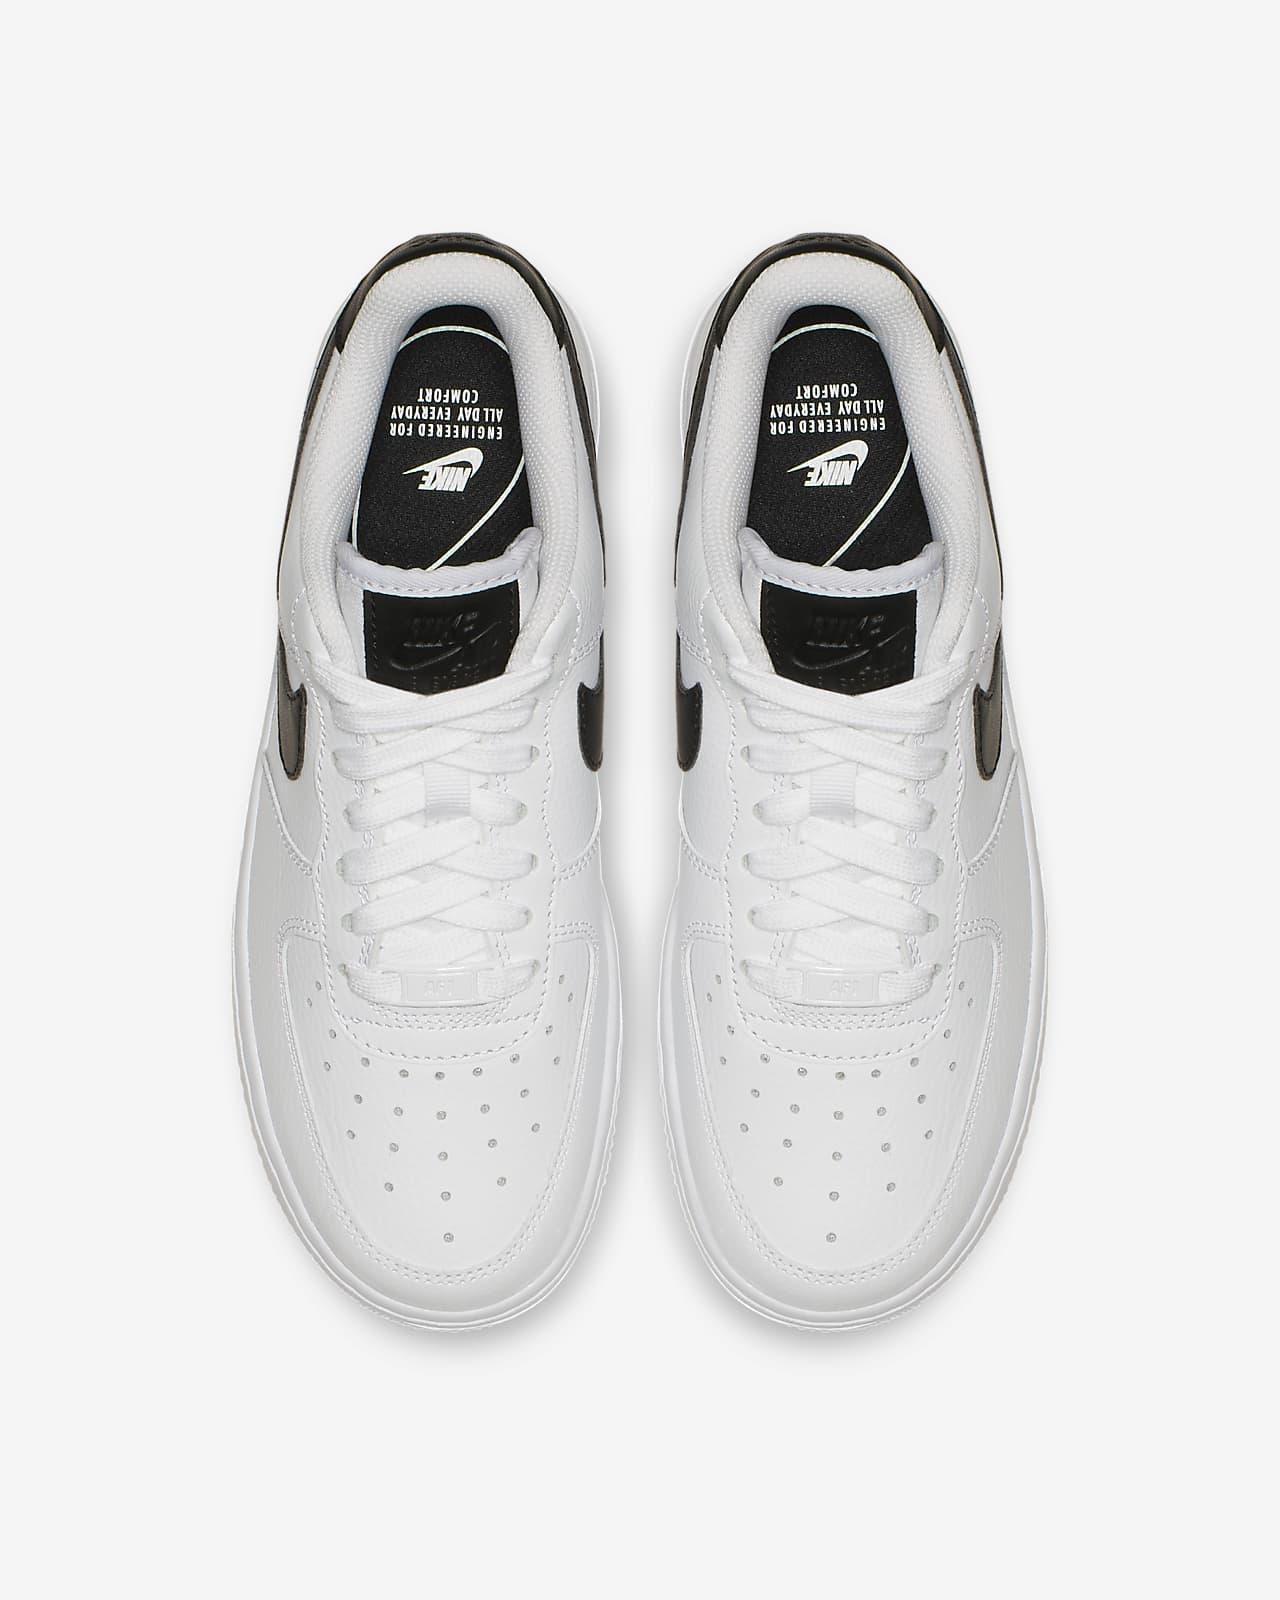 Chaussure Nike Air Force 1 '07 pour Femme. Nike LU